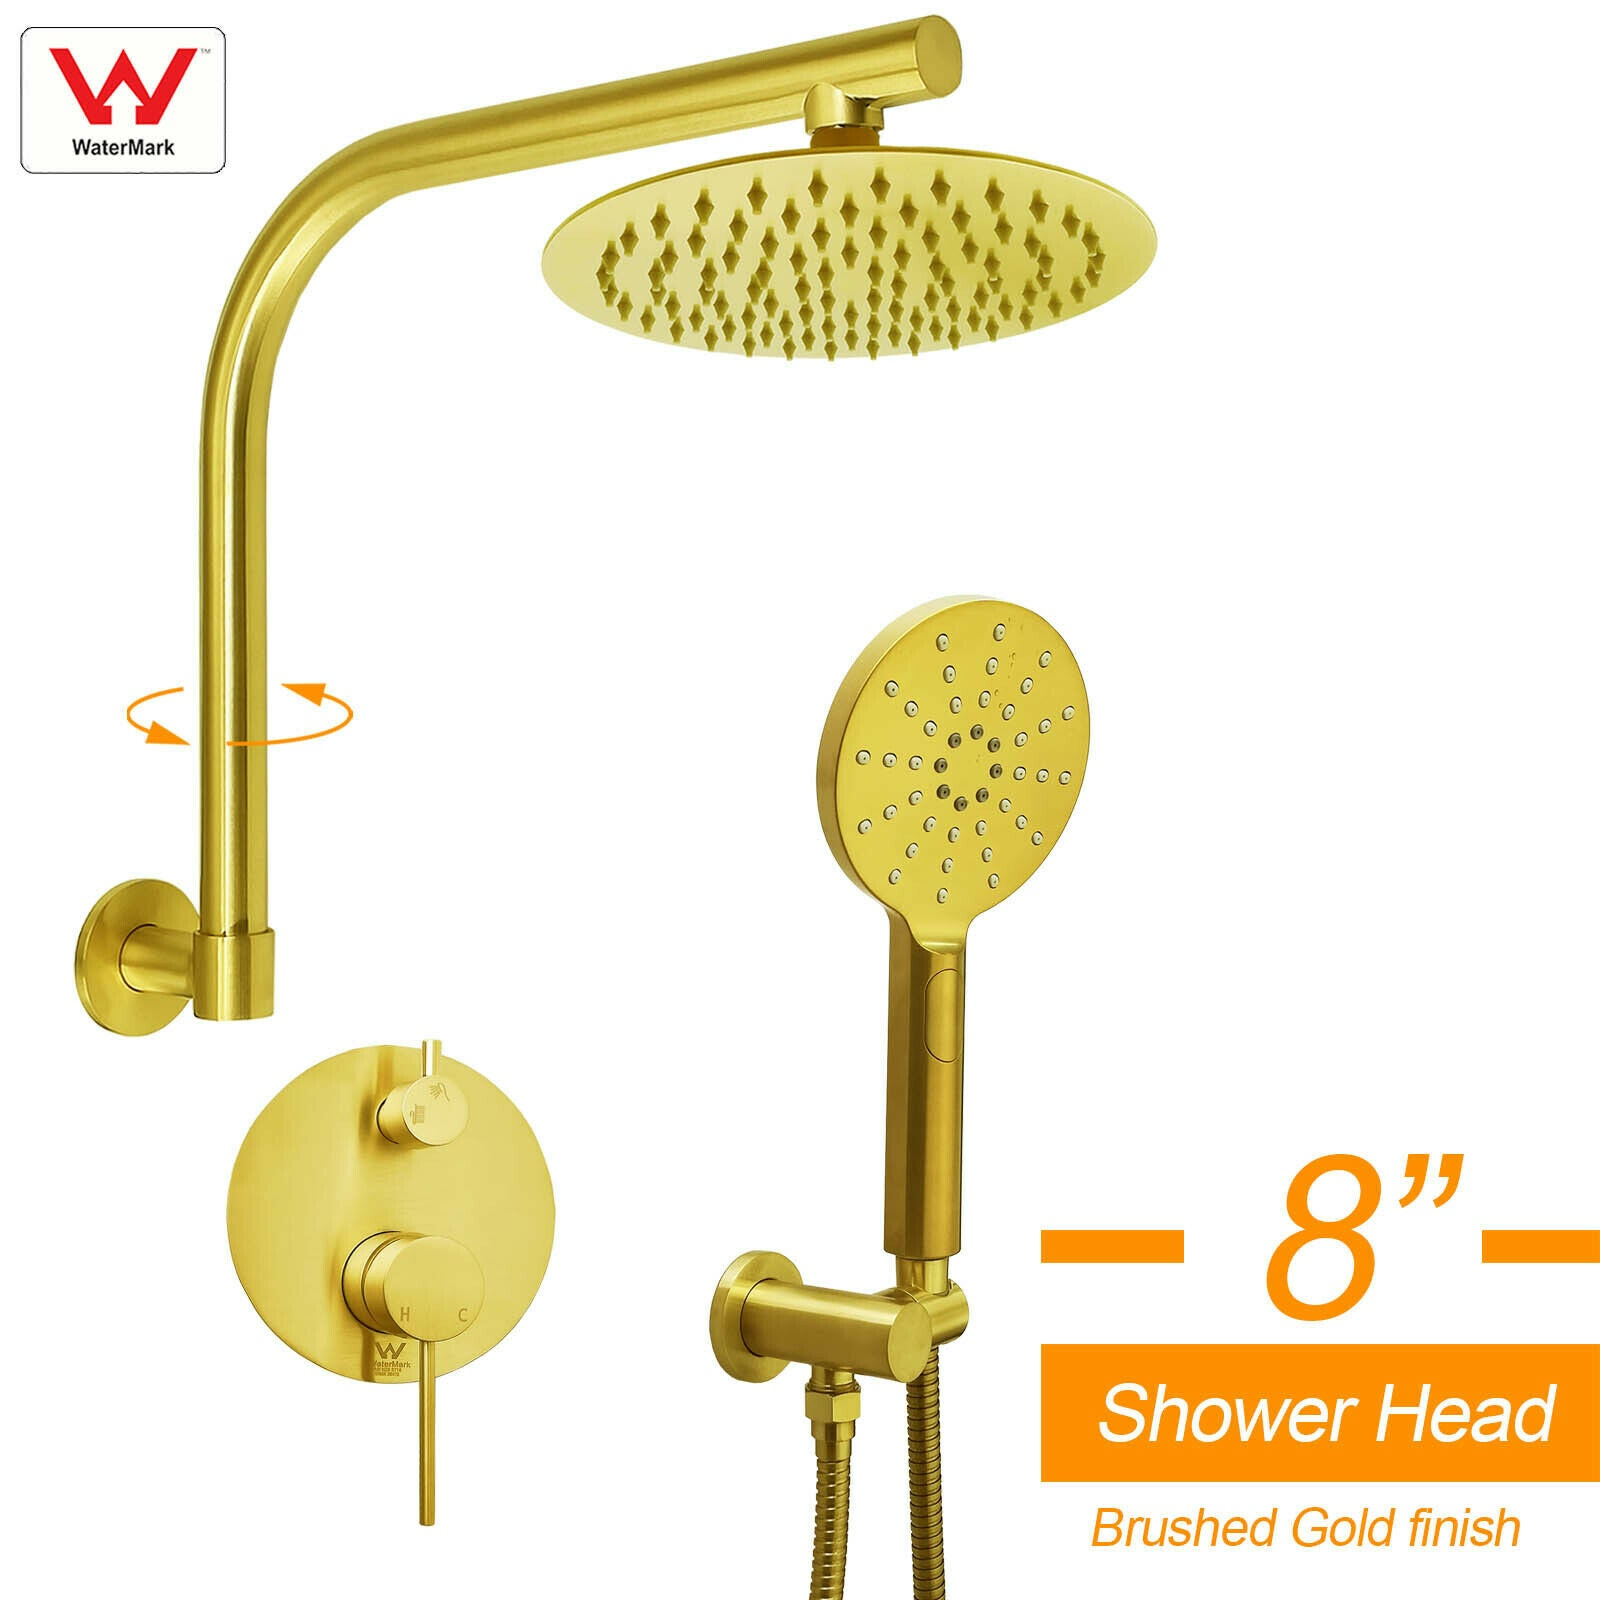 "WELS Brushed Gold 8"" Round Rainfall Shower Head 360?? Swivel Gooseneck Arm Combo"